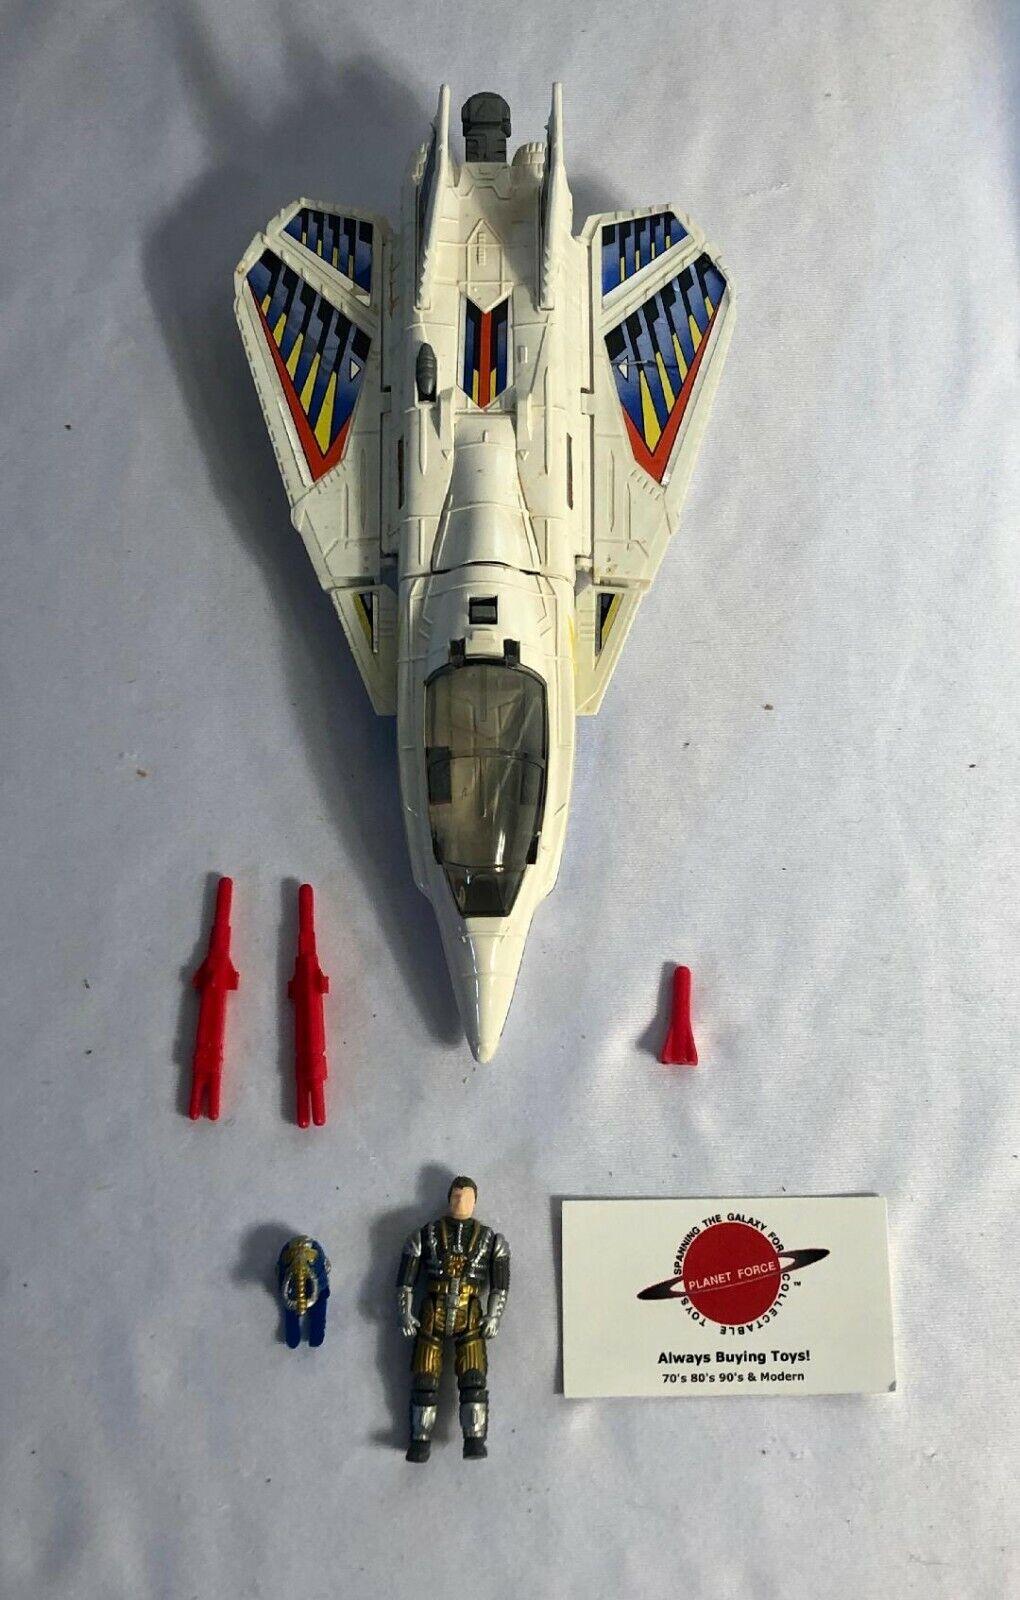 1987 Meteor & Ace Riker completa Vintage M.a.s.k Kenner vehículo